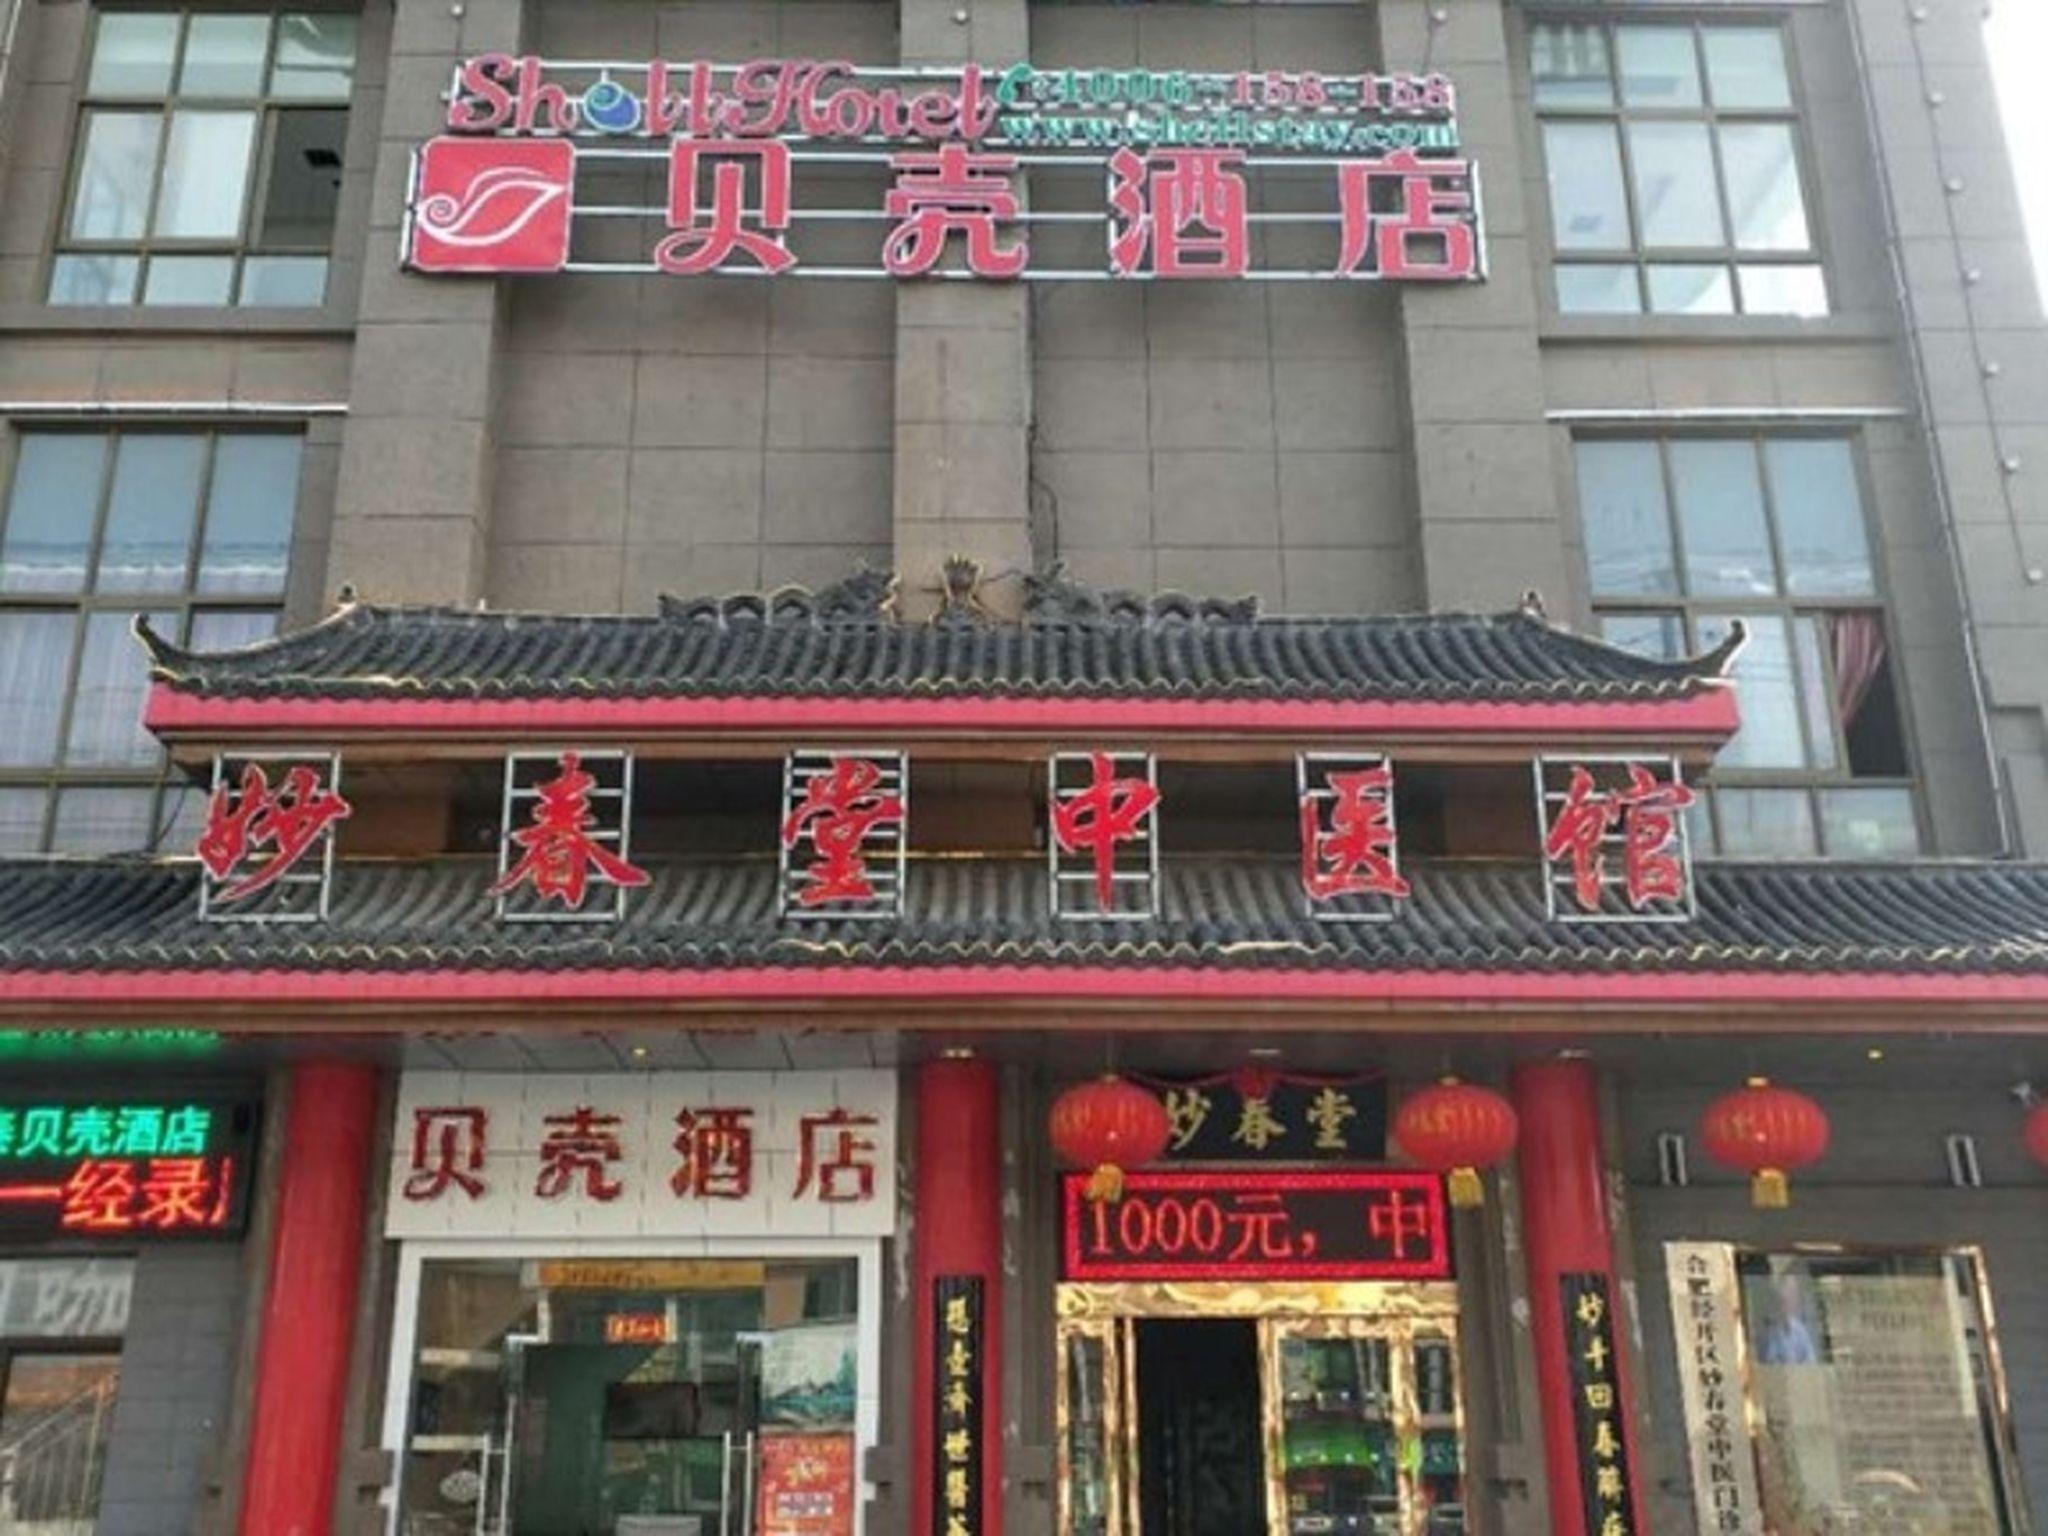 Shell Hefei Economic Development Zone HK And Macao Square Hotel